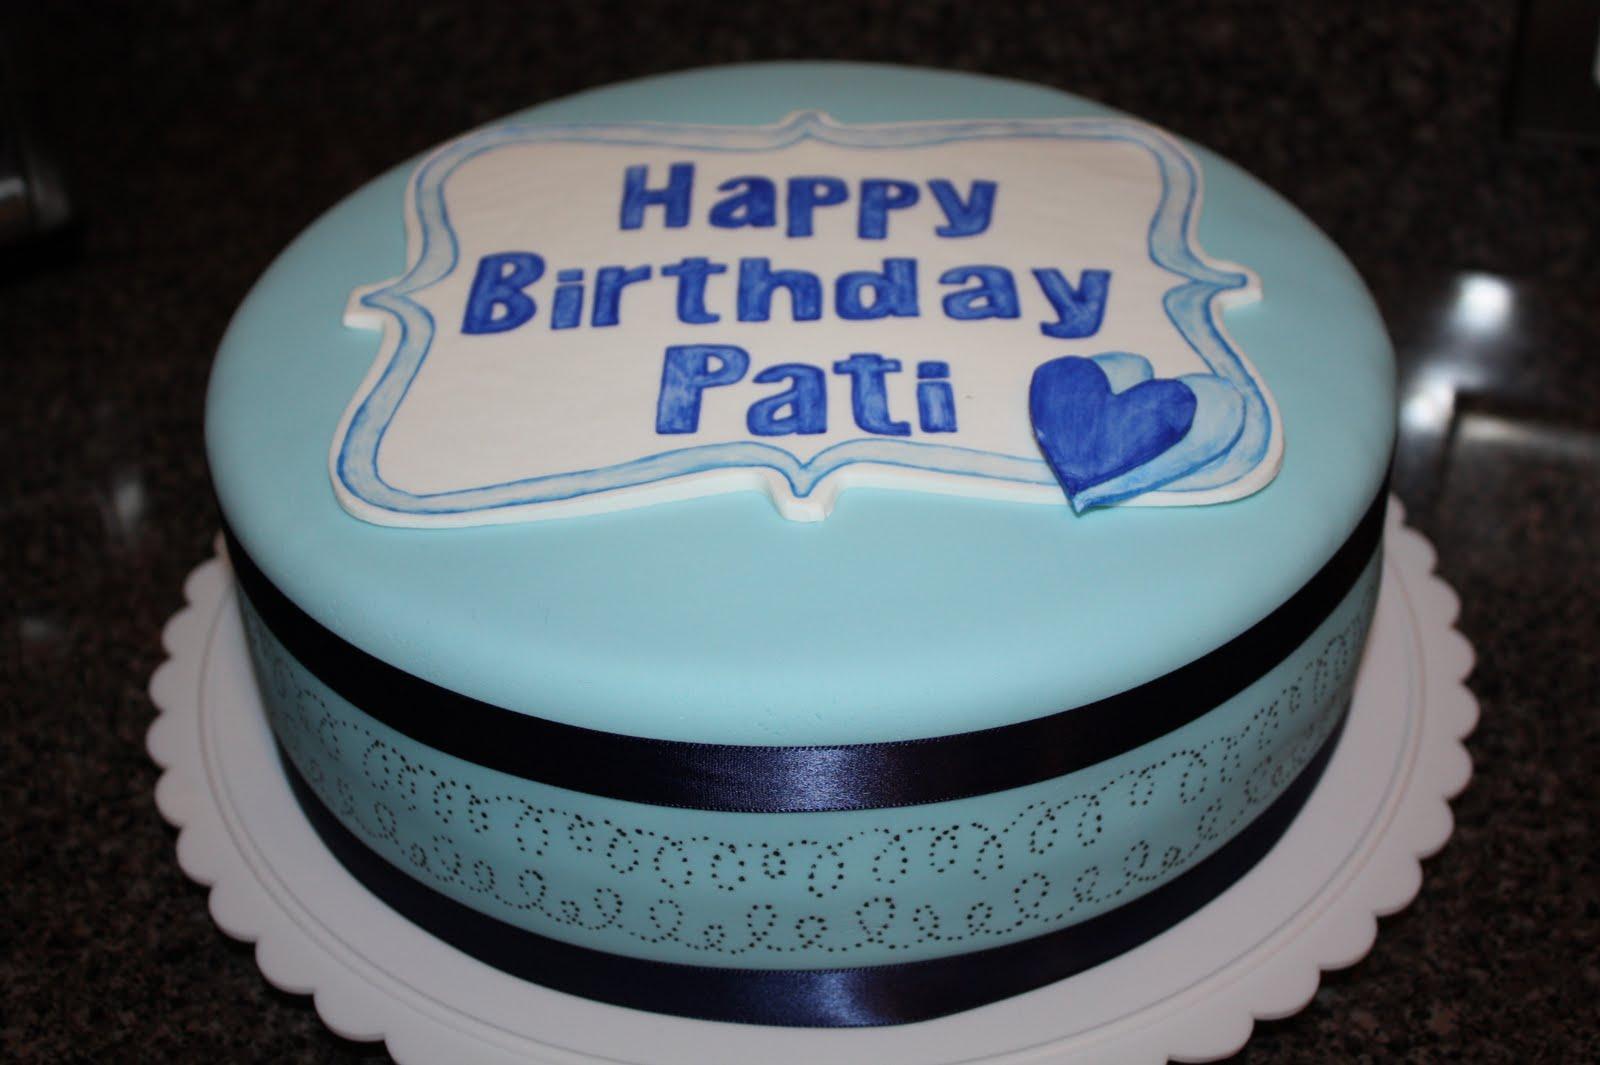 Birthday Cake Decorating Ideas With Fondant